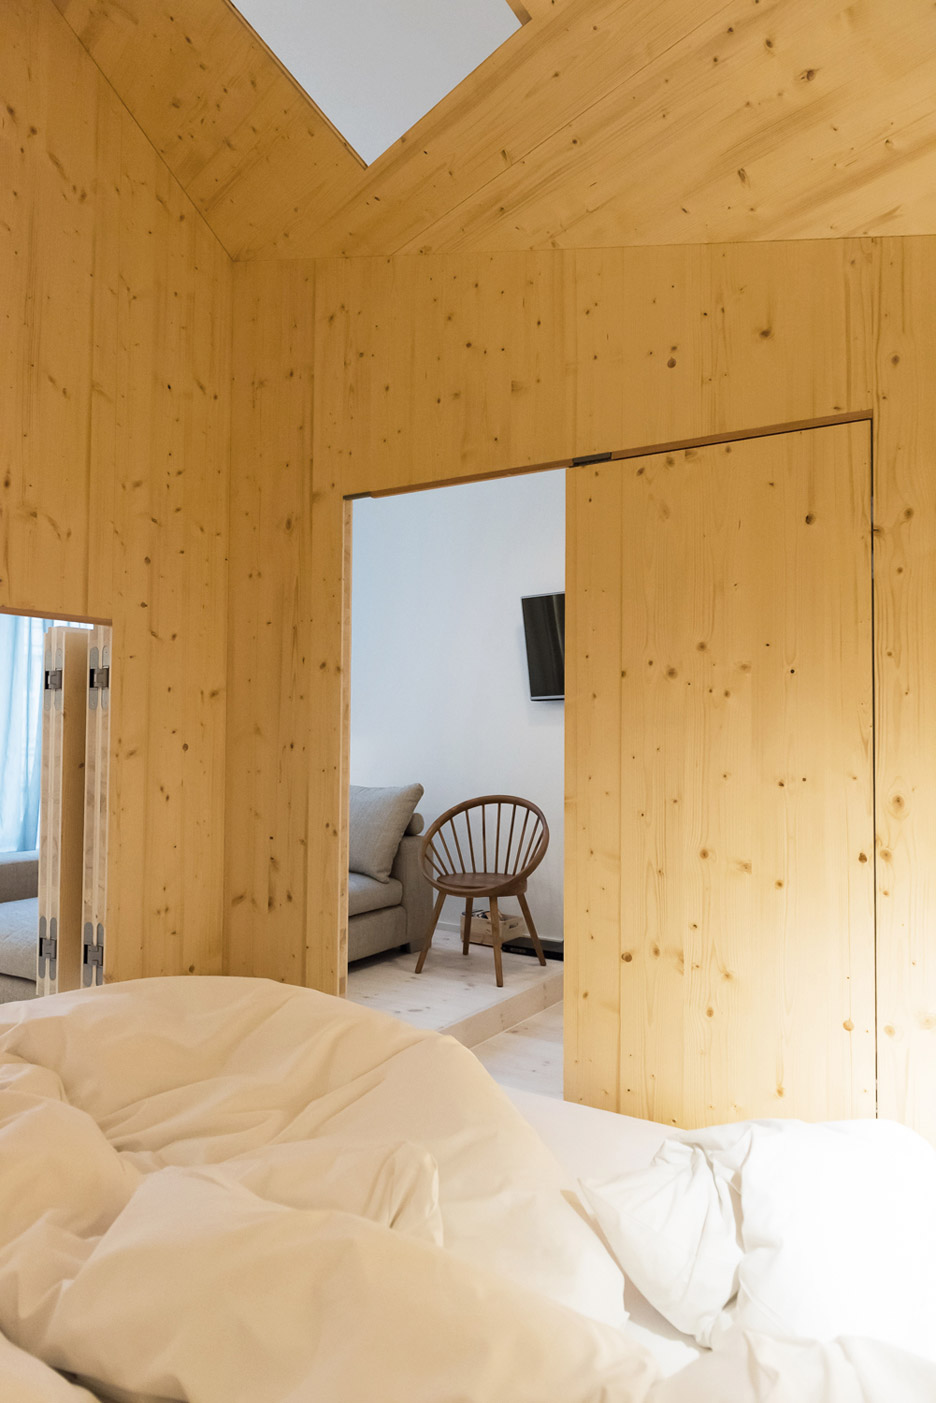 Michelberger hotel room by Sigurd Larsen